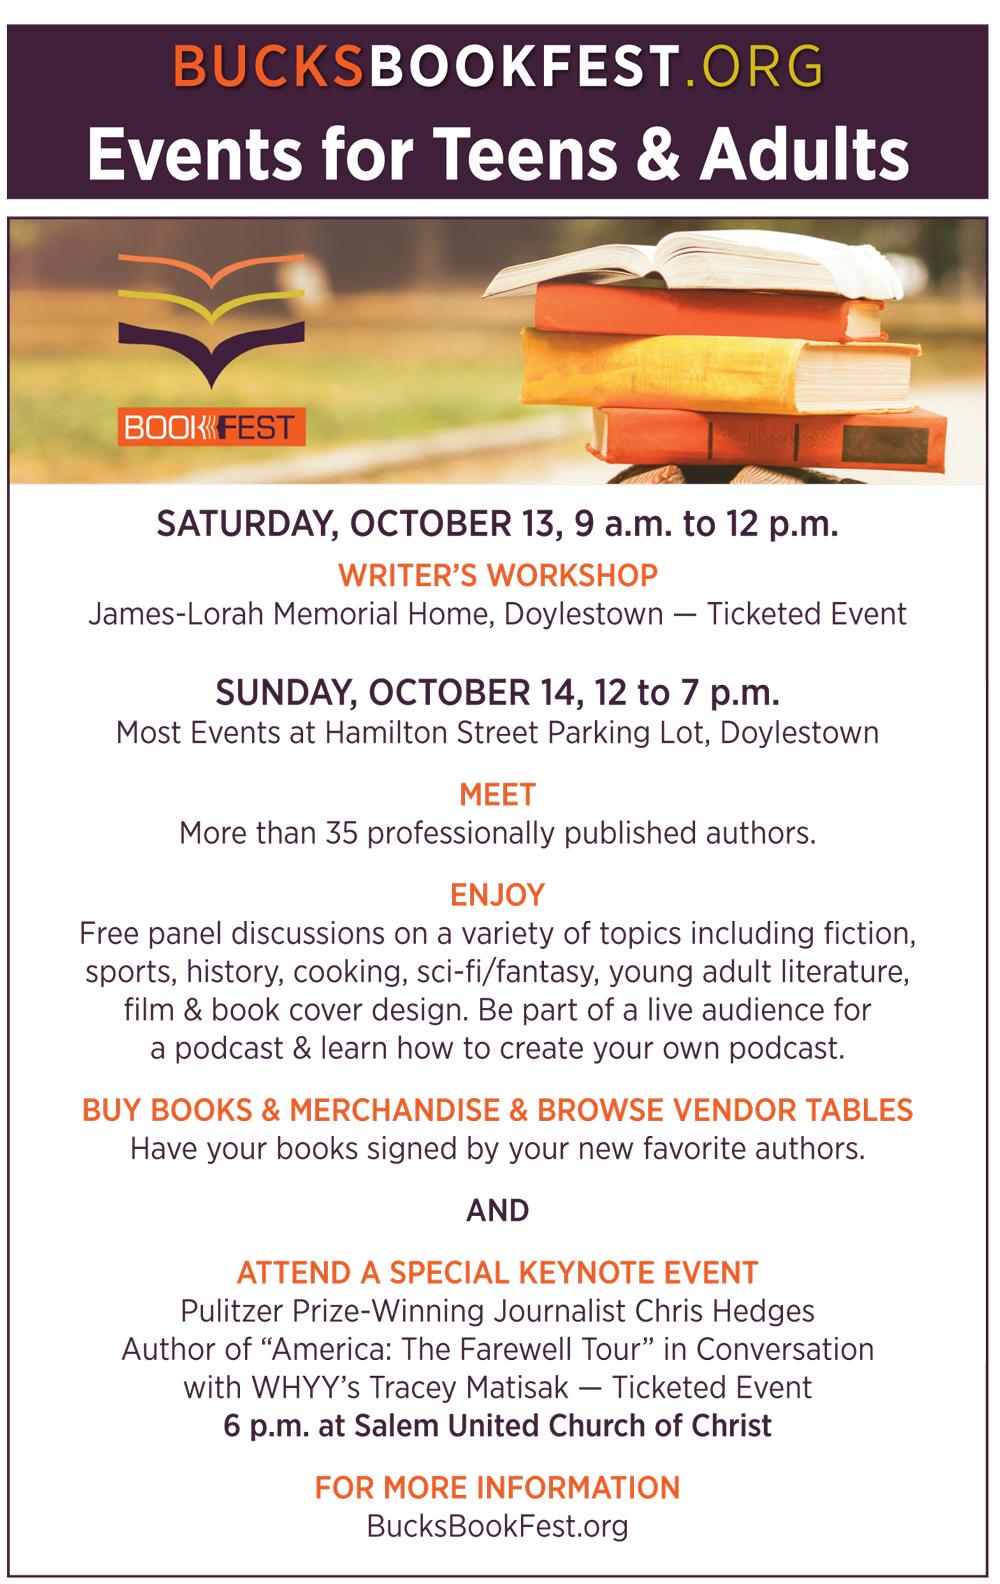 adult-teen-events-flyer.jpg